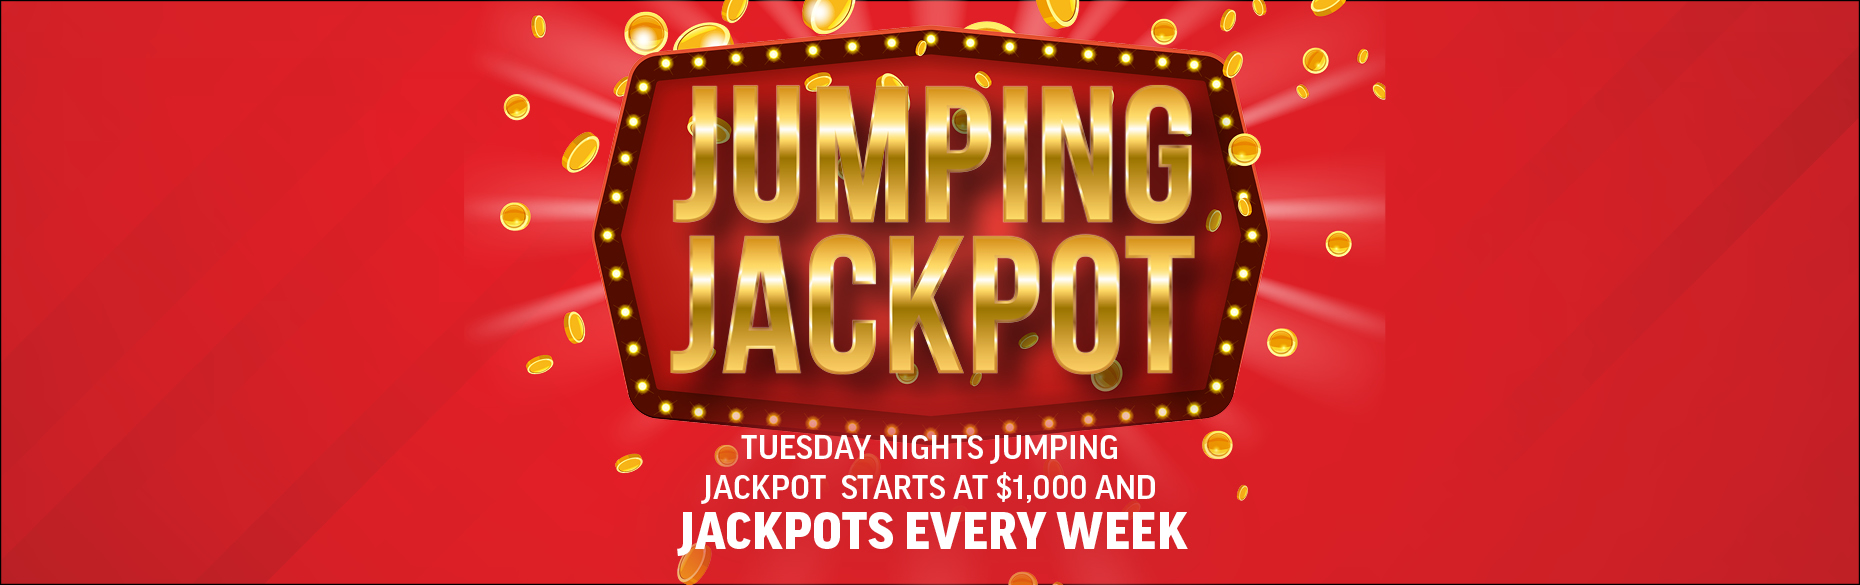 NRSL_Jumping-Jackpot_Web-Banner